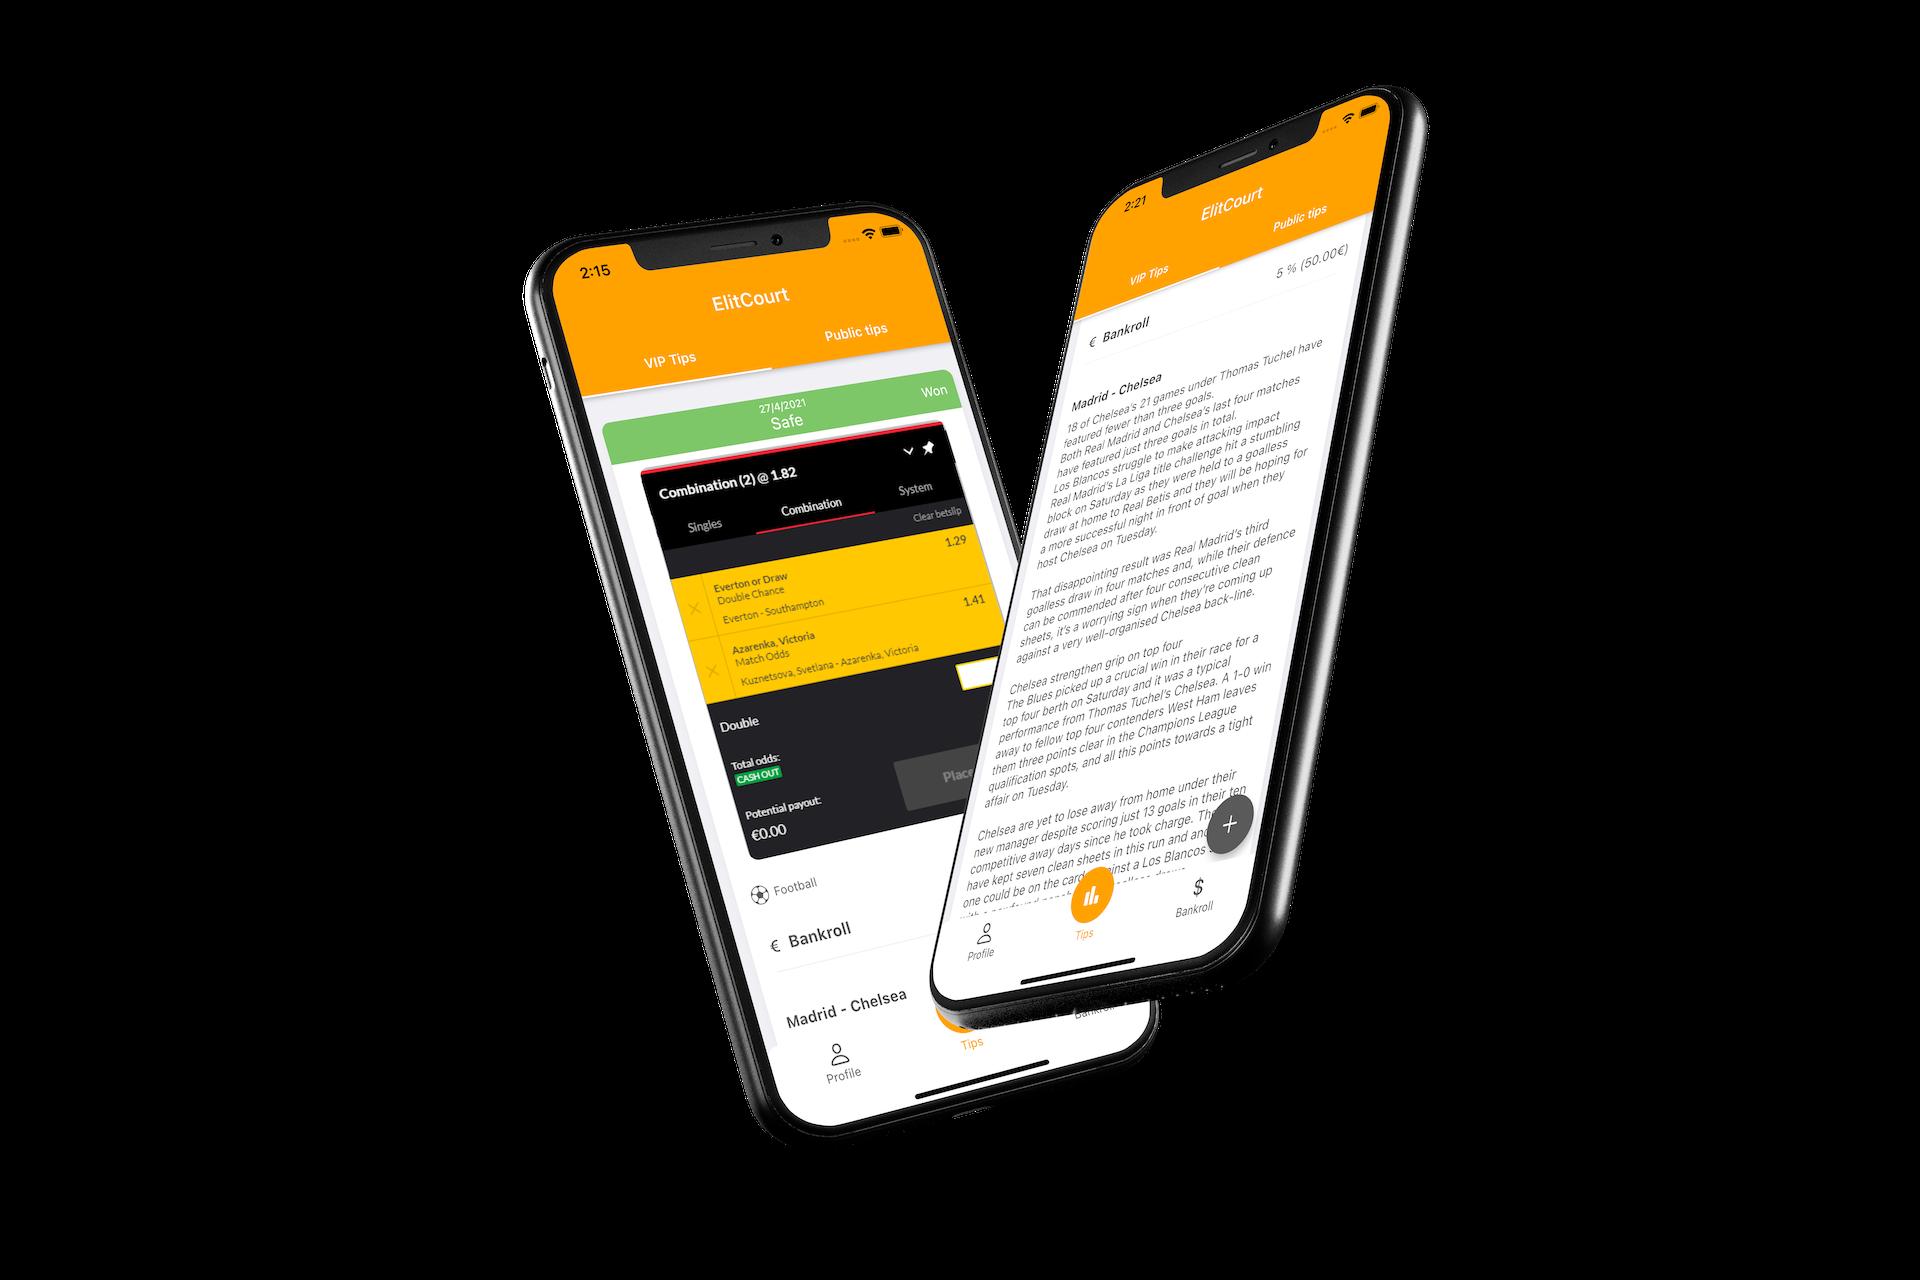 Elitcourt application - Application mobile